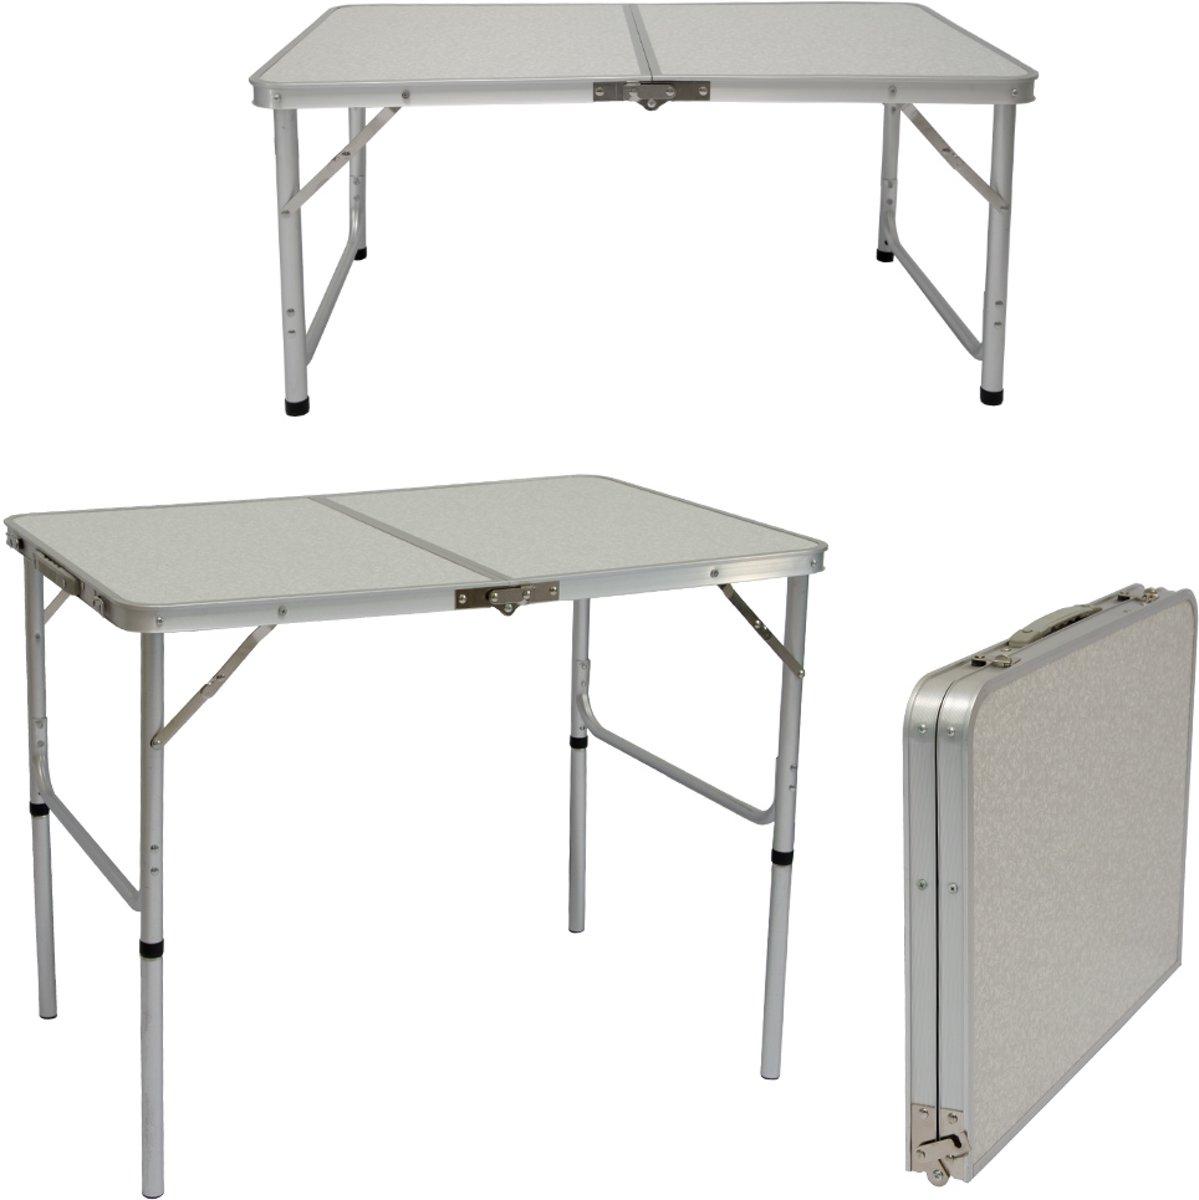 Campingtafel 90cm x60cm x60cm klaptafel koffer tafel klaptafel tuintafel balkontafel